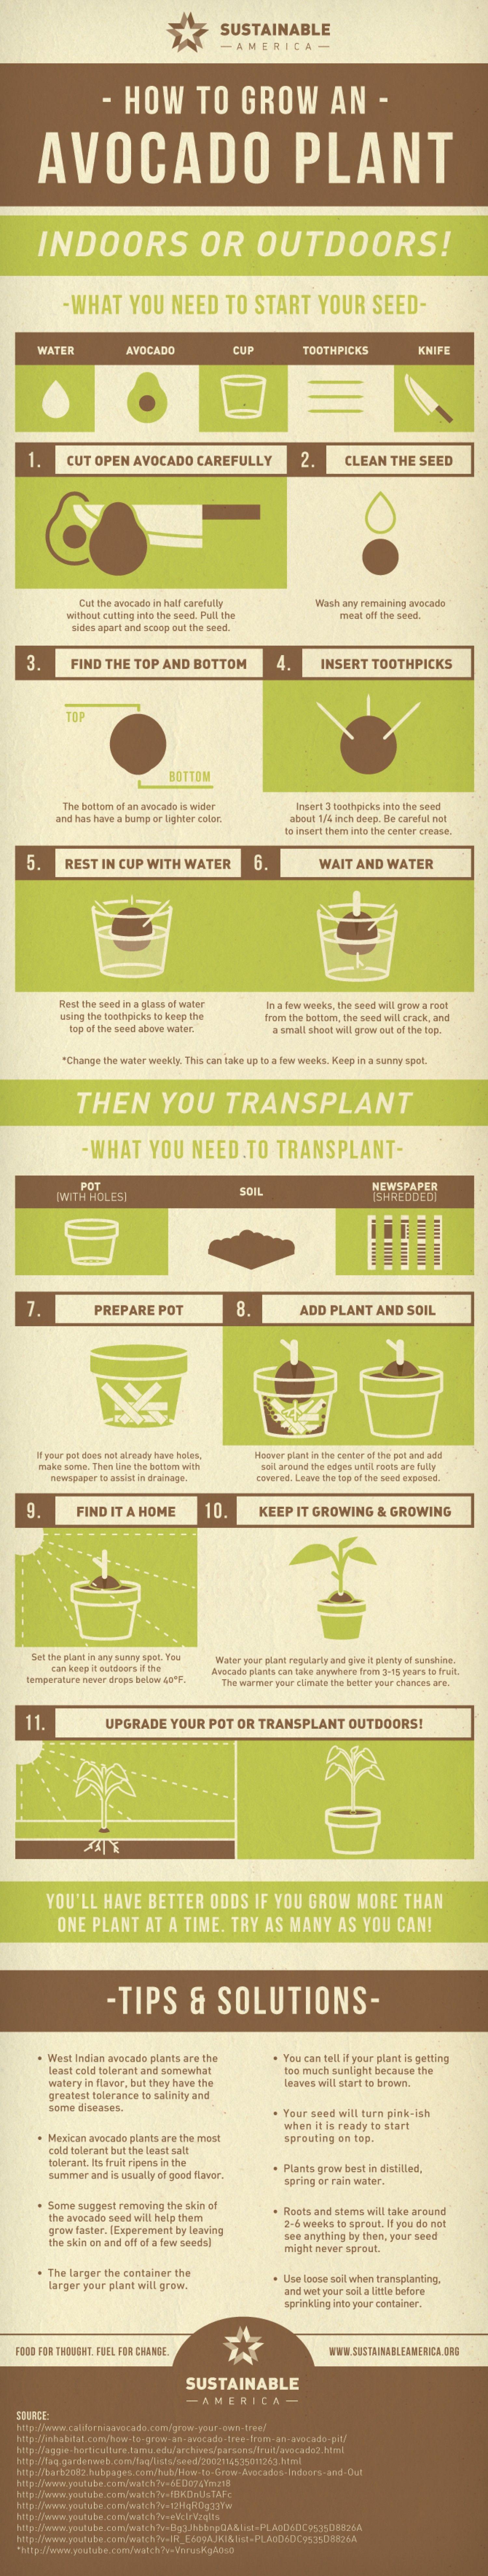 How to Grow an Avocado